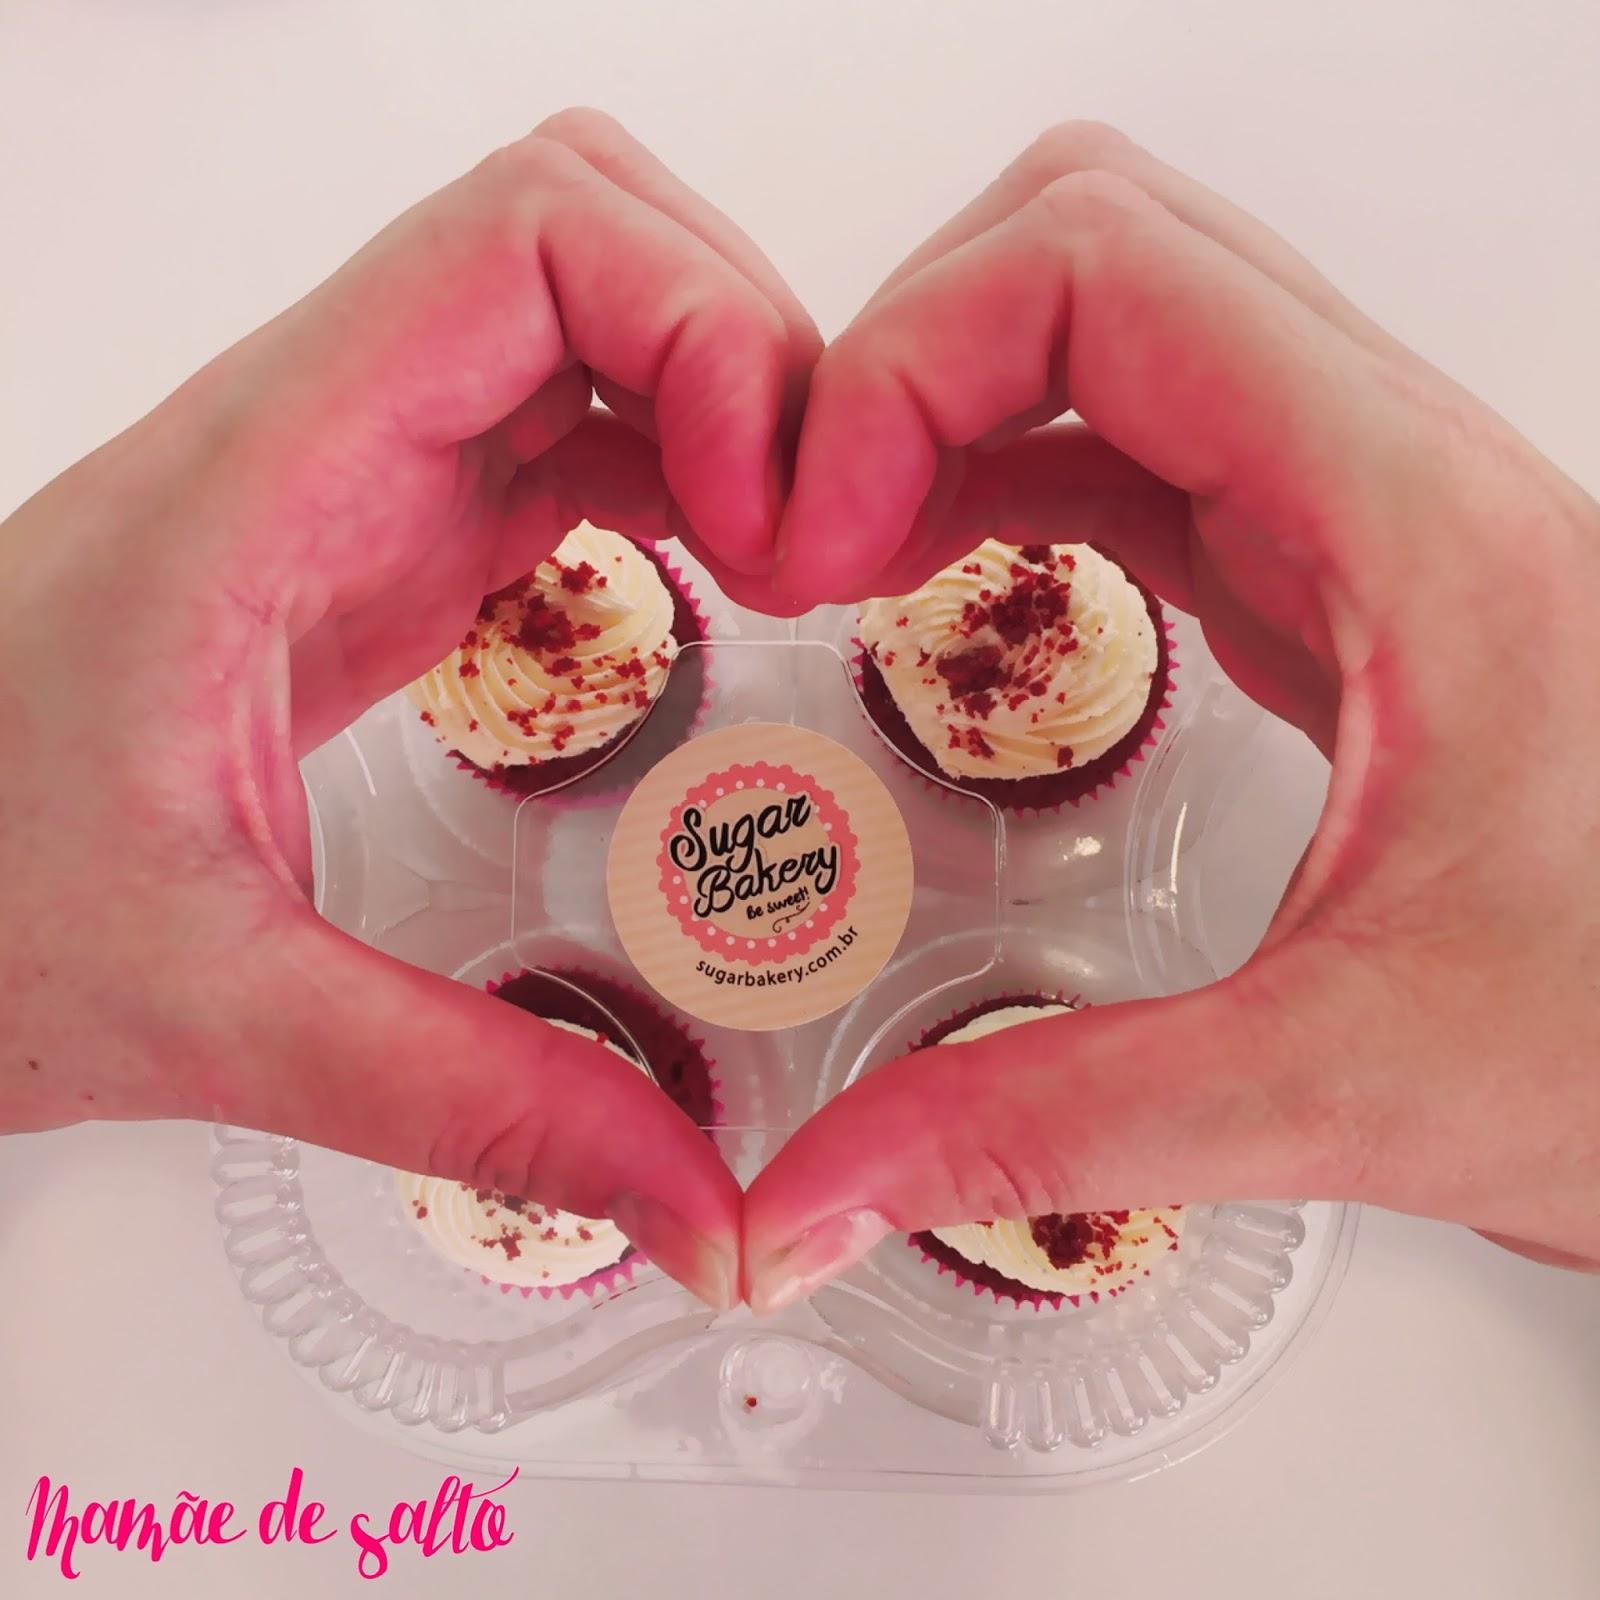 cupcake red velvet Sugar Bakery Curitiba/PR ... blog Mamãe de Salto